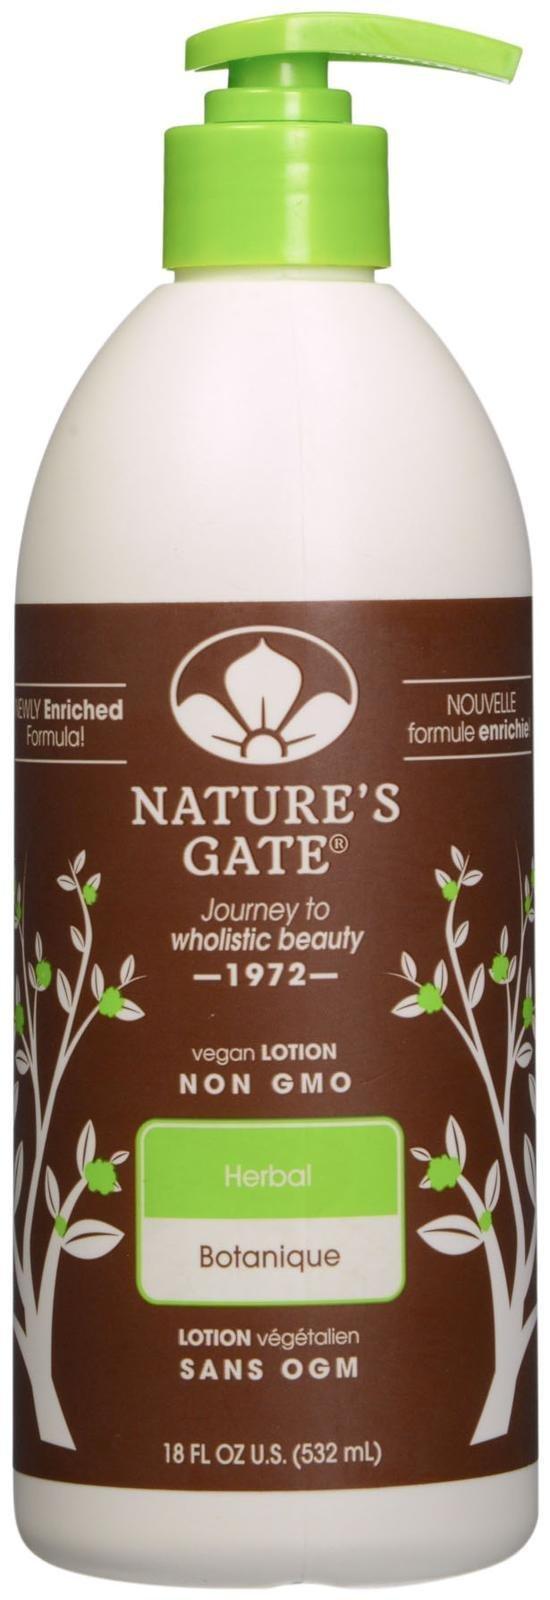 Nature S Gate Herbal Moisturizing Lotion